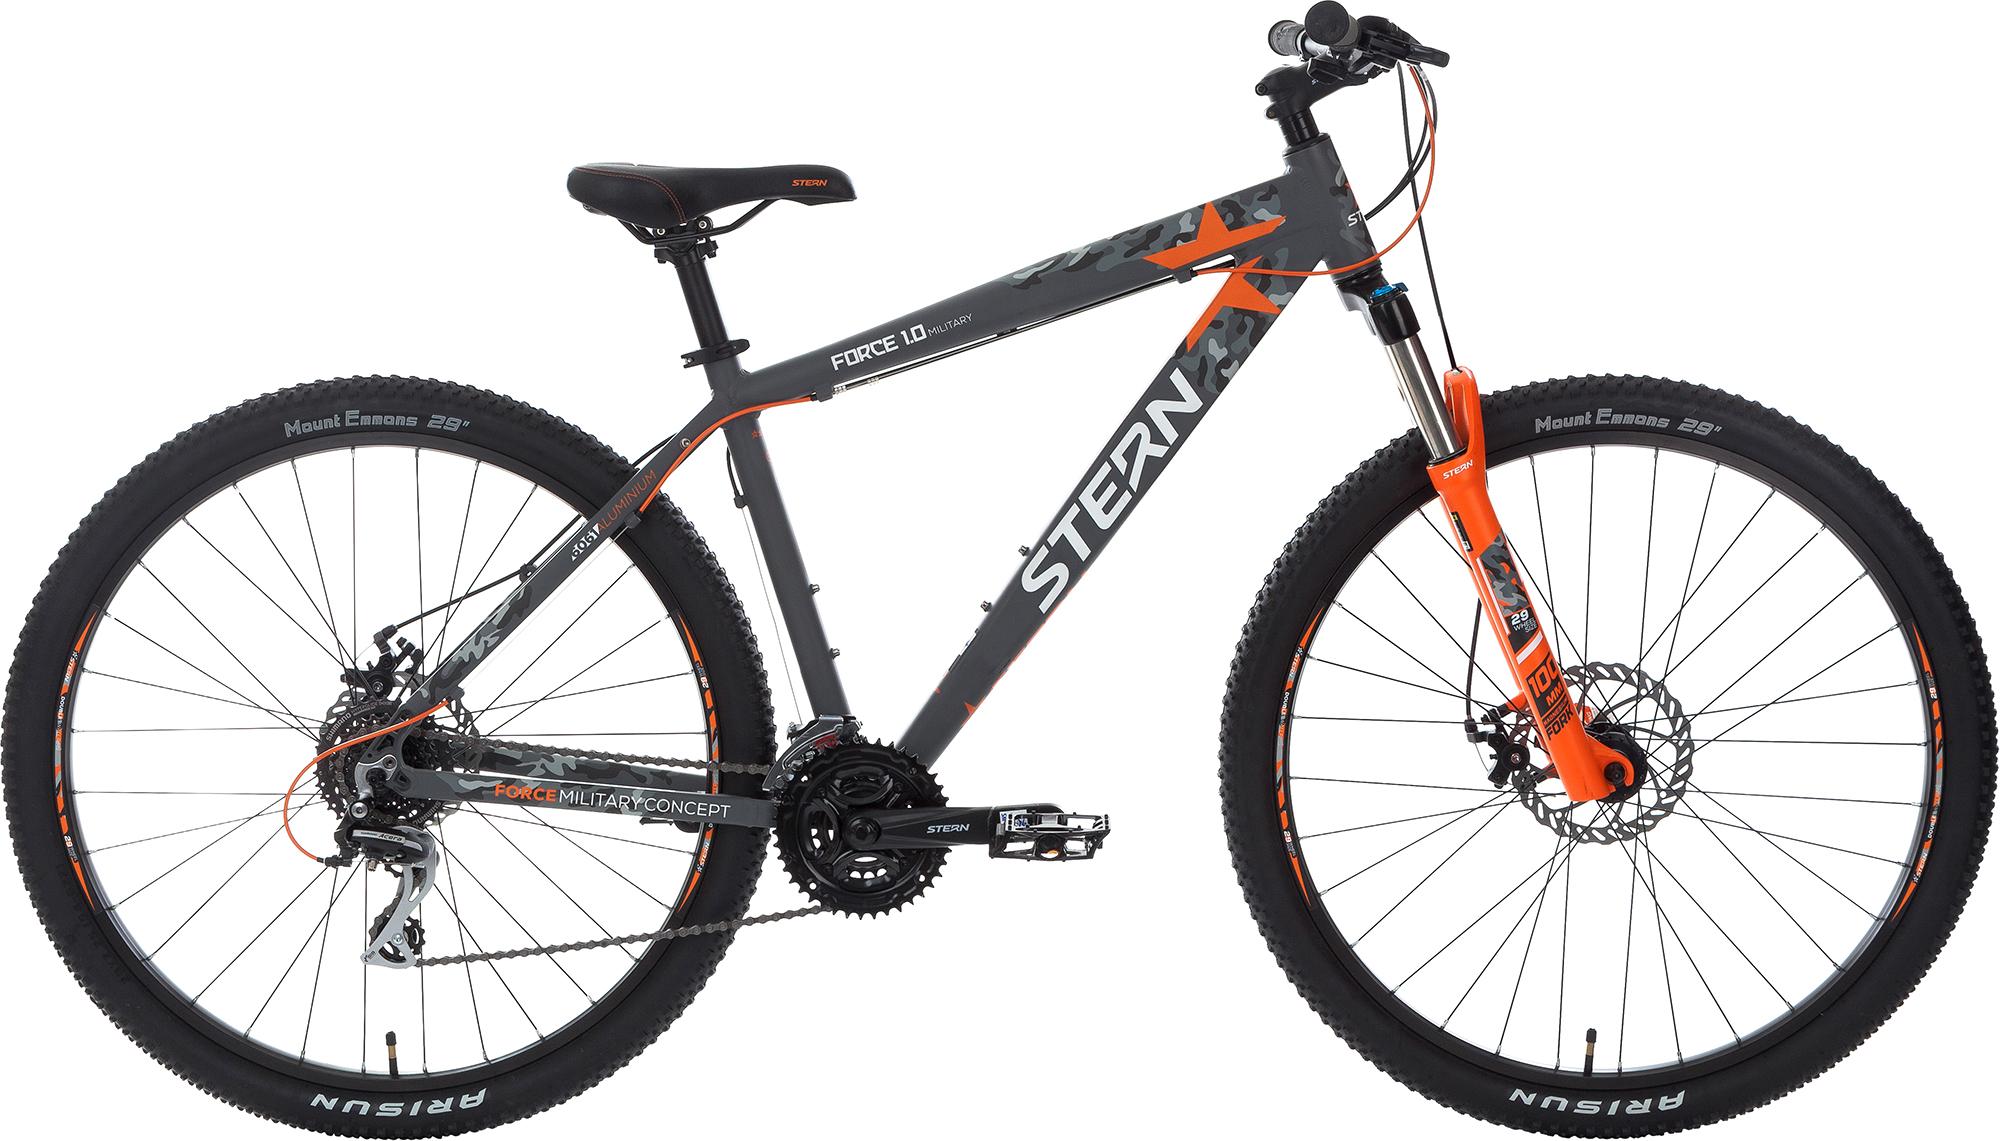 Stern Велосипед горный Force 1.0 alt 29